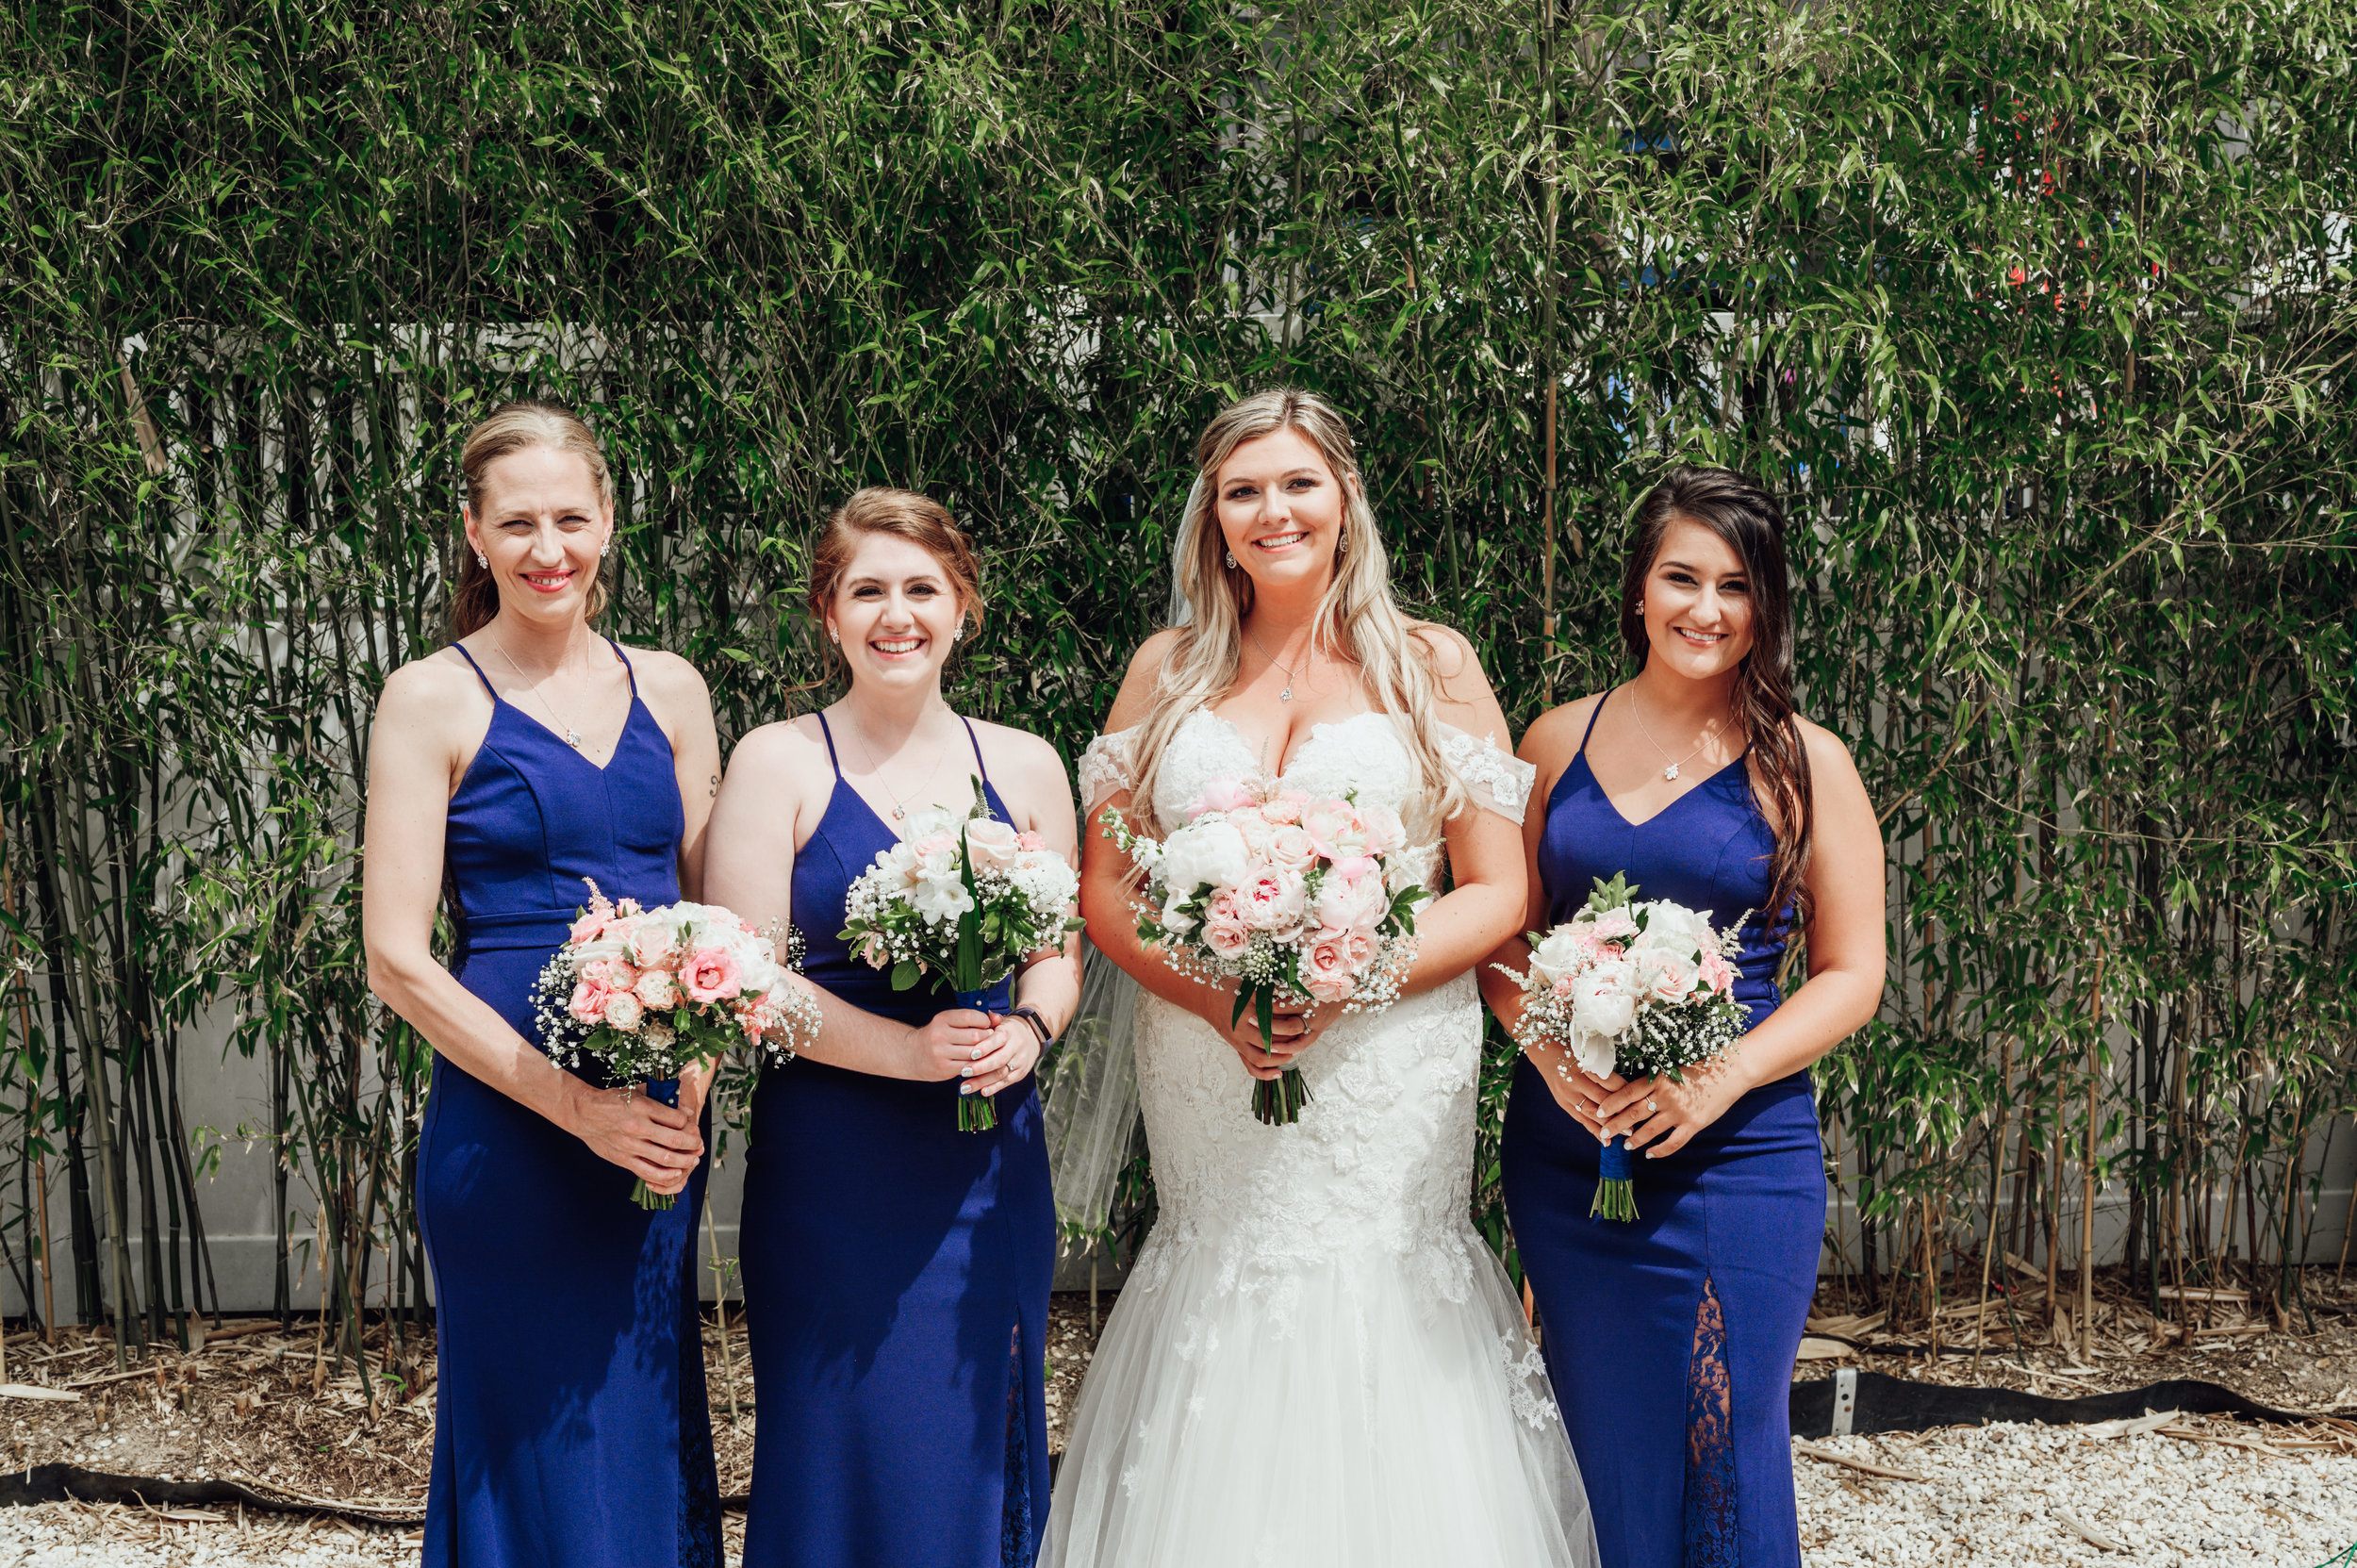 New Jersey Wedding Photographer, Felsberg Photography LBI wedding photography 52.jpg